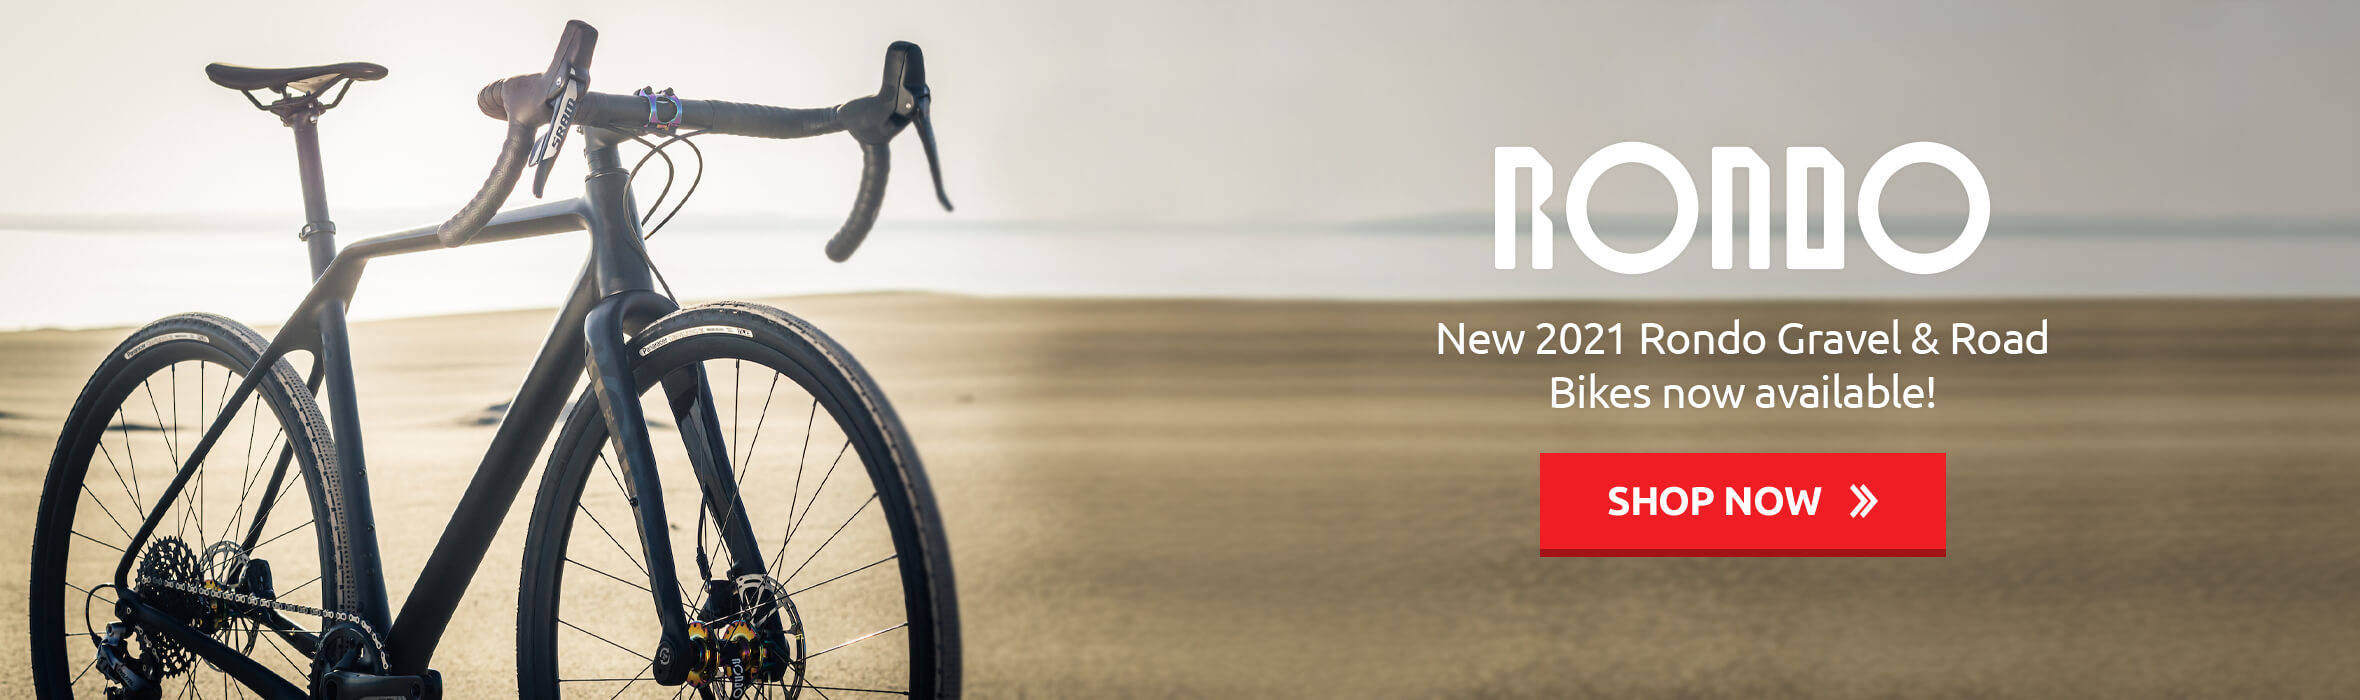 Shop Rondo Gravel & Road Bikes